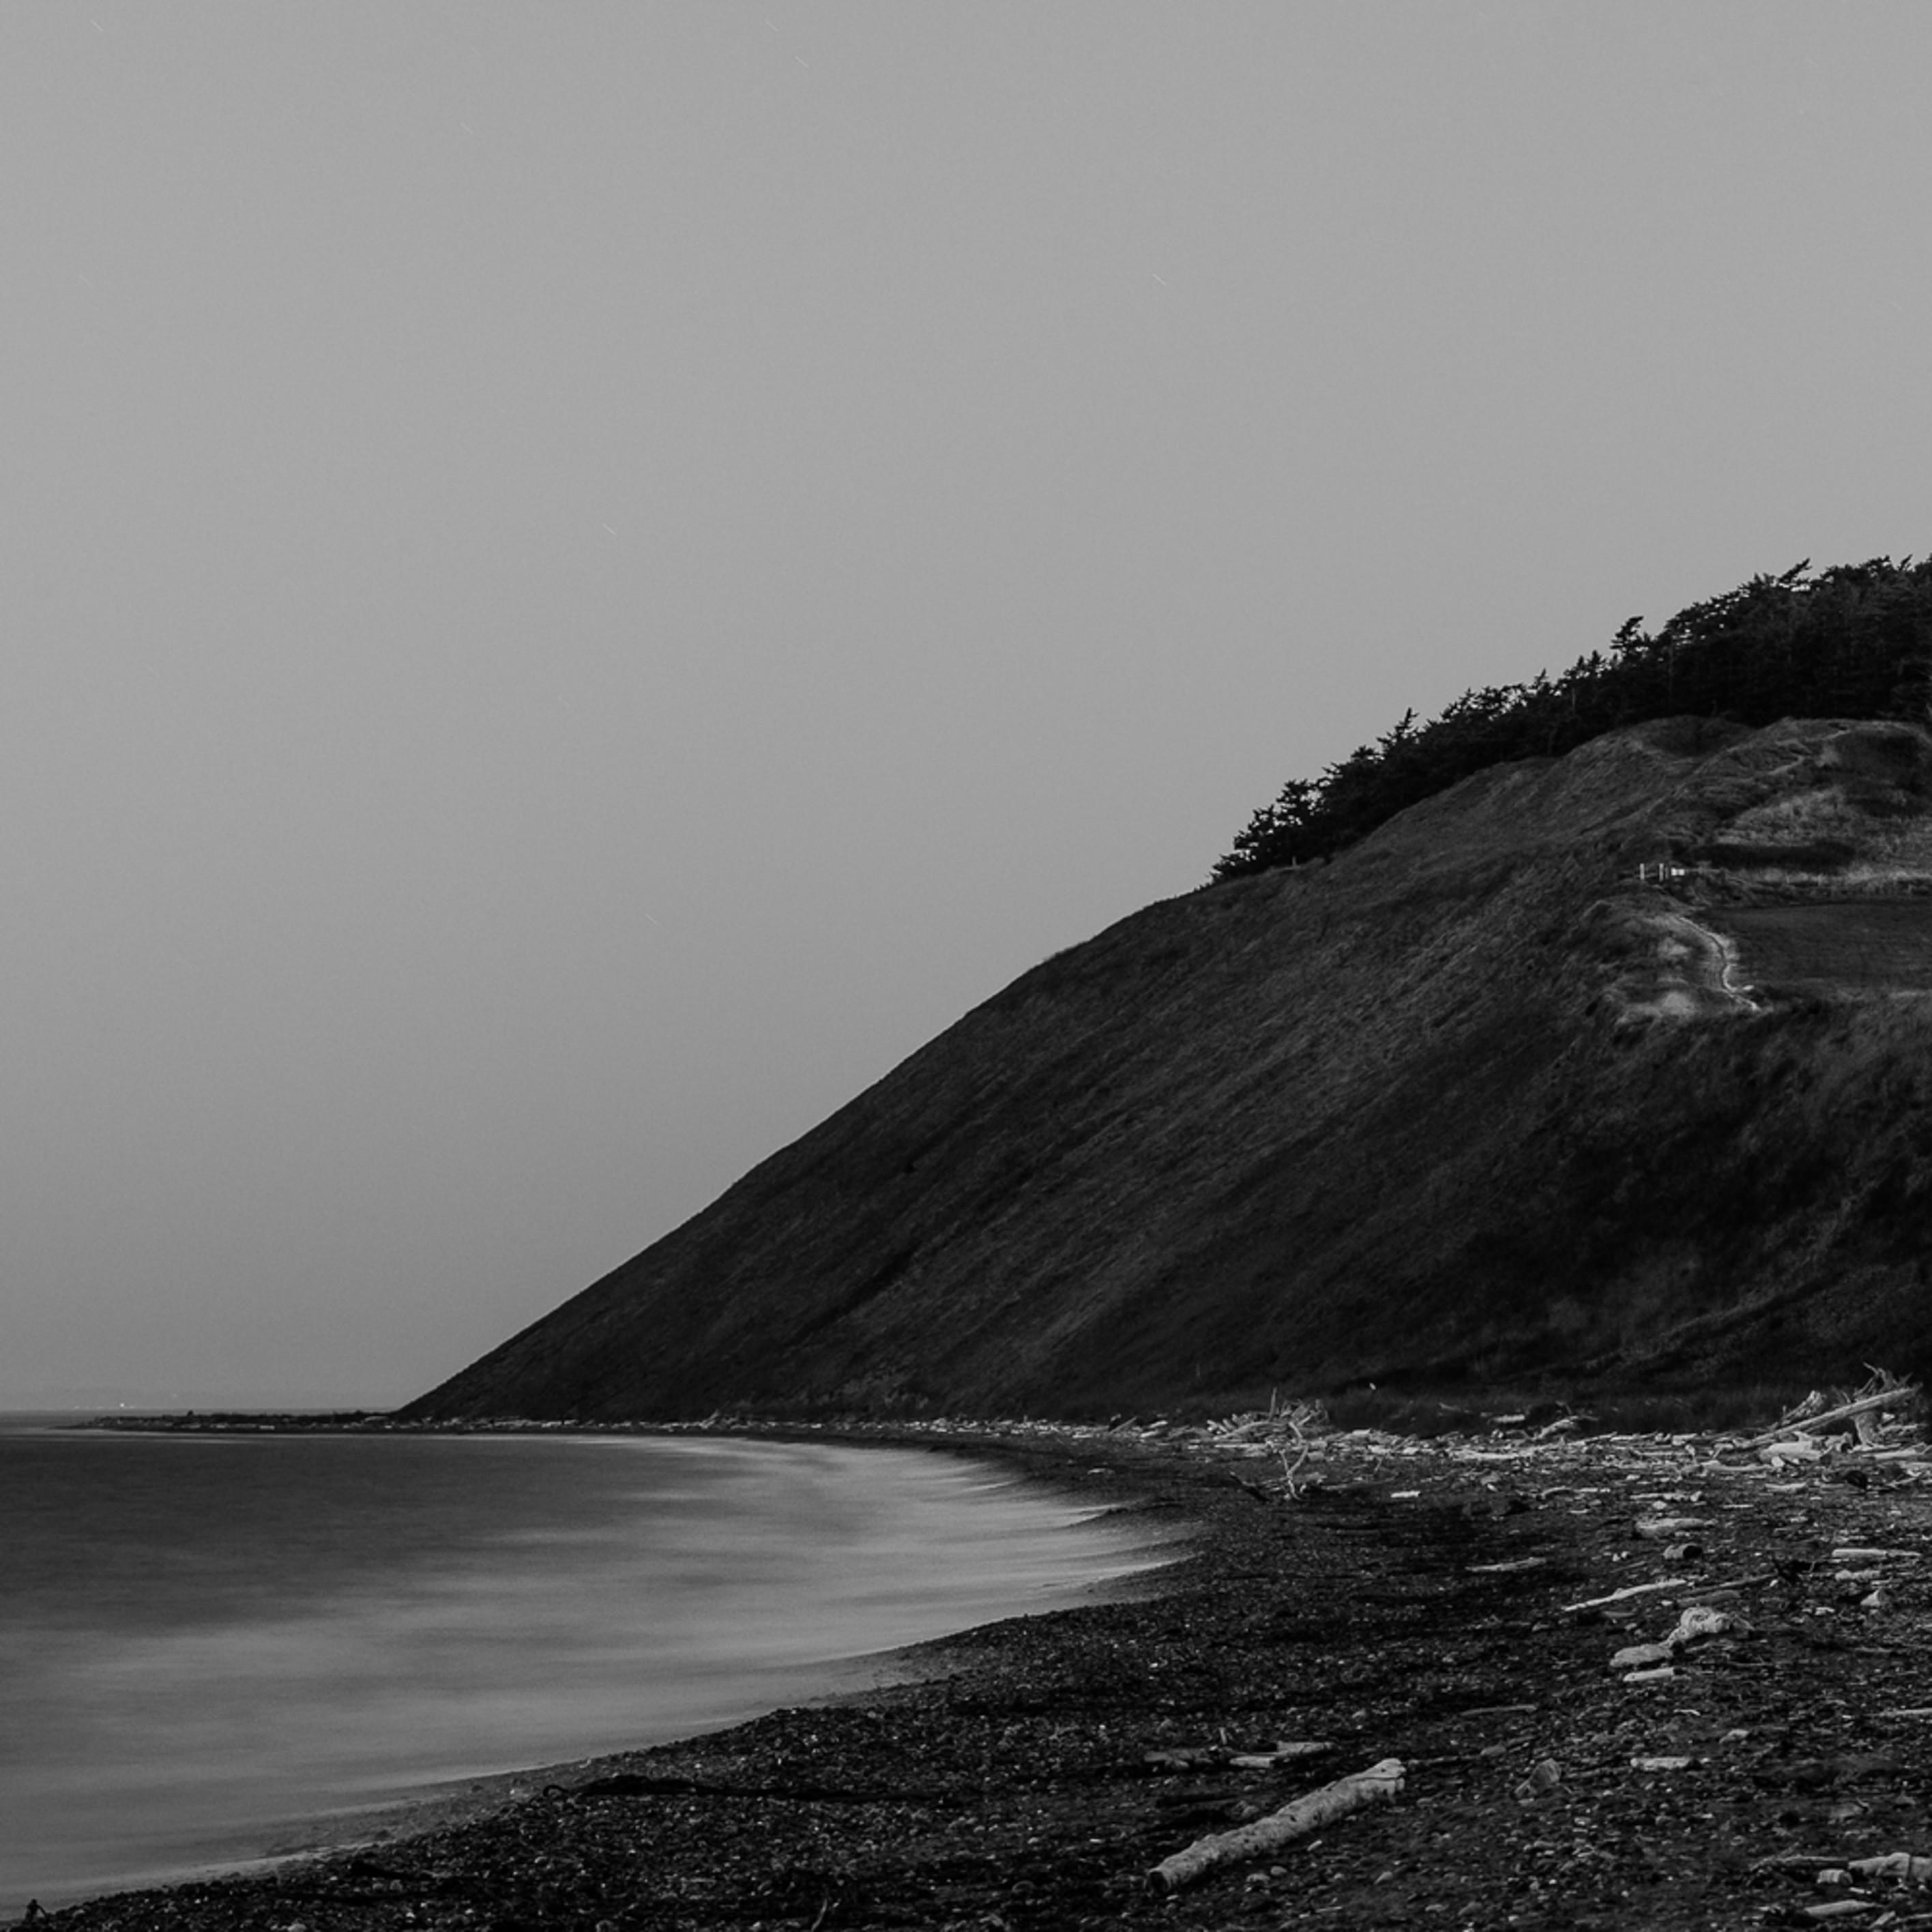 Before first light whidbey island washington 2016 nptcmh